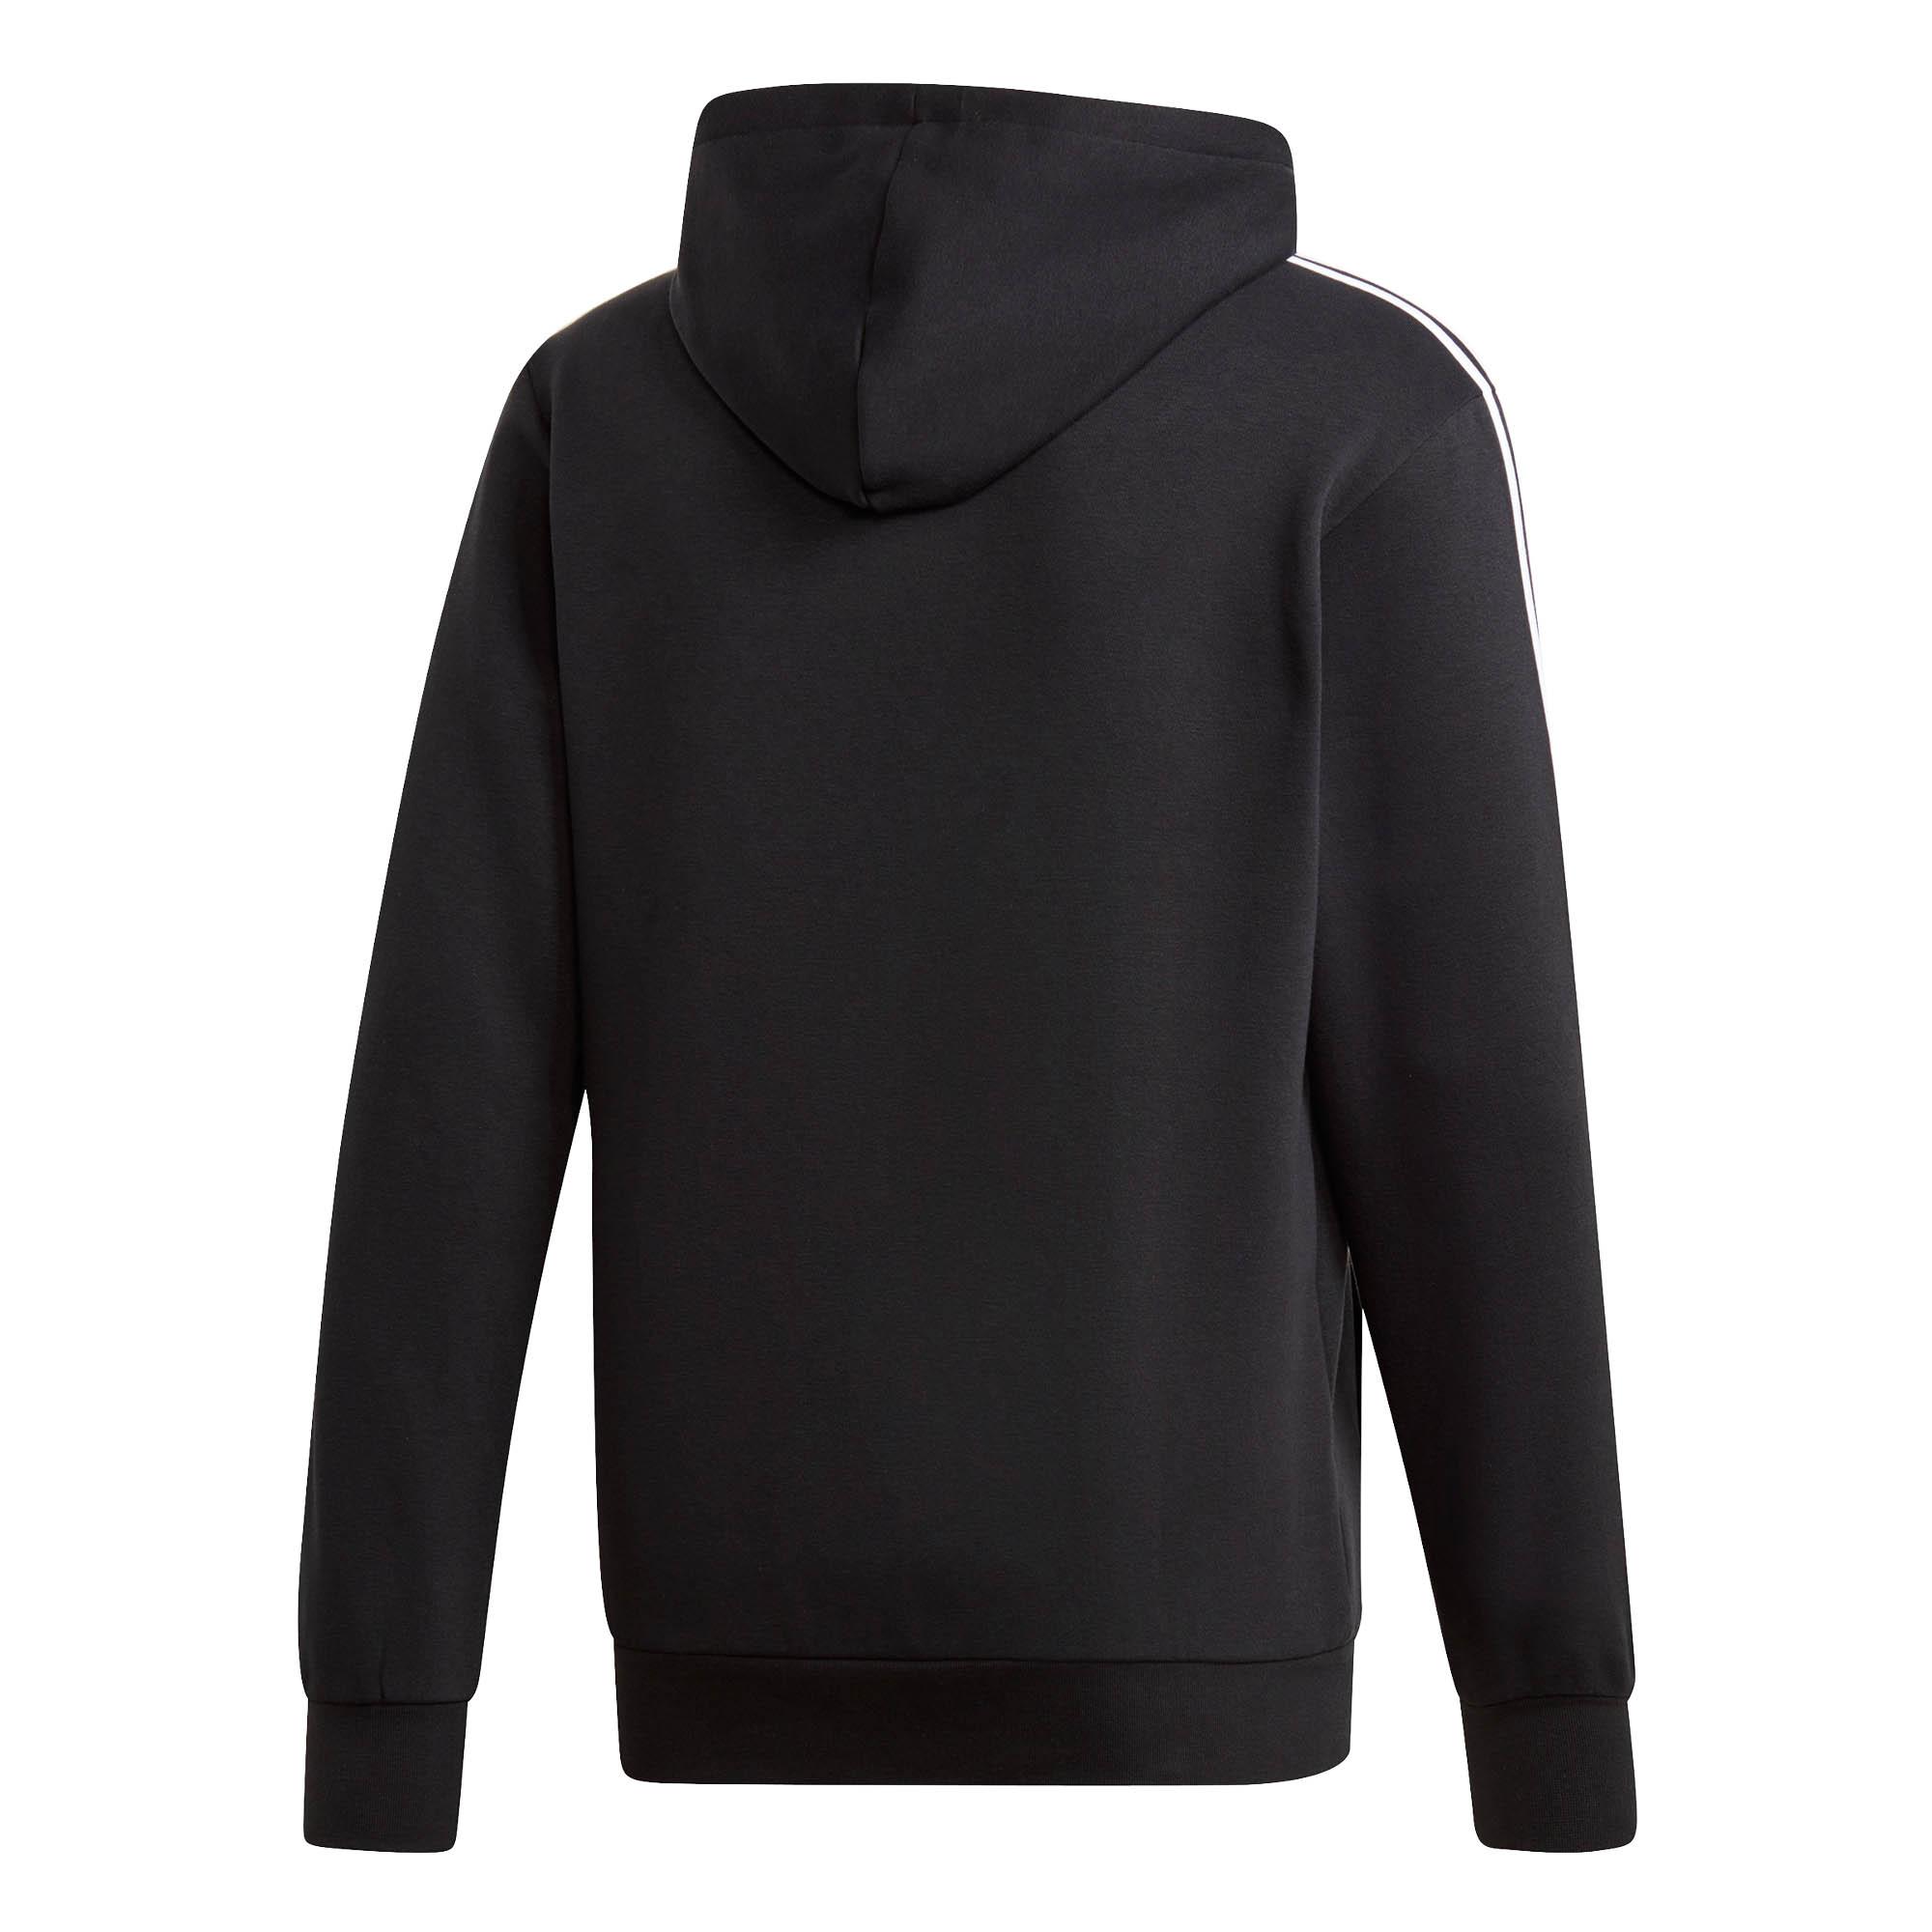 adidas-Essential-3-Stripe-Mens-Over-Head-Hoodie-Hoody-Jacket-Black-White thumbnail 4